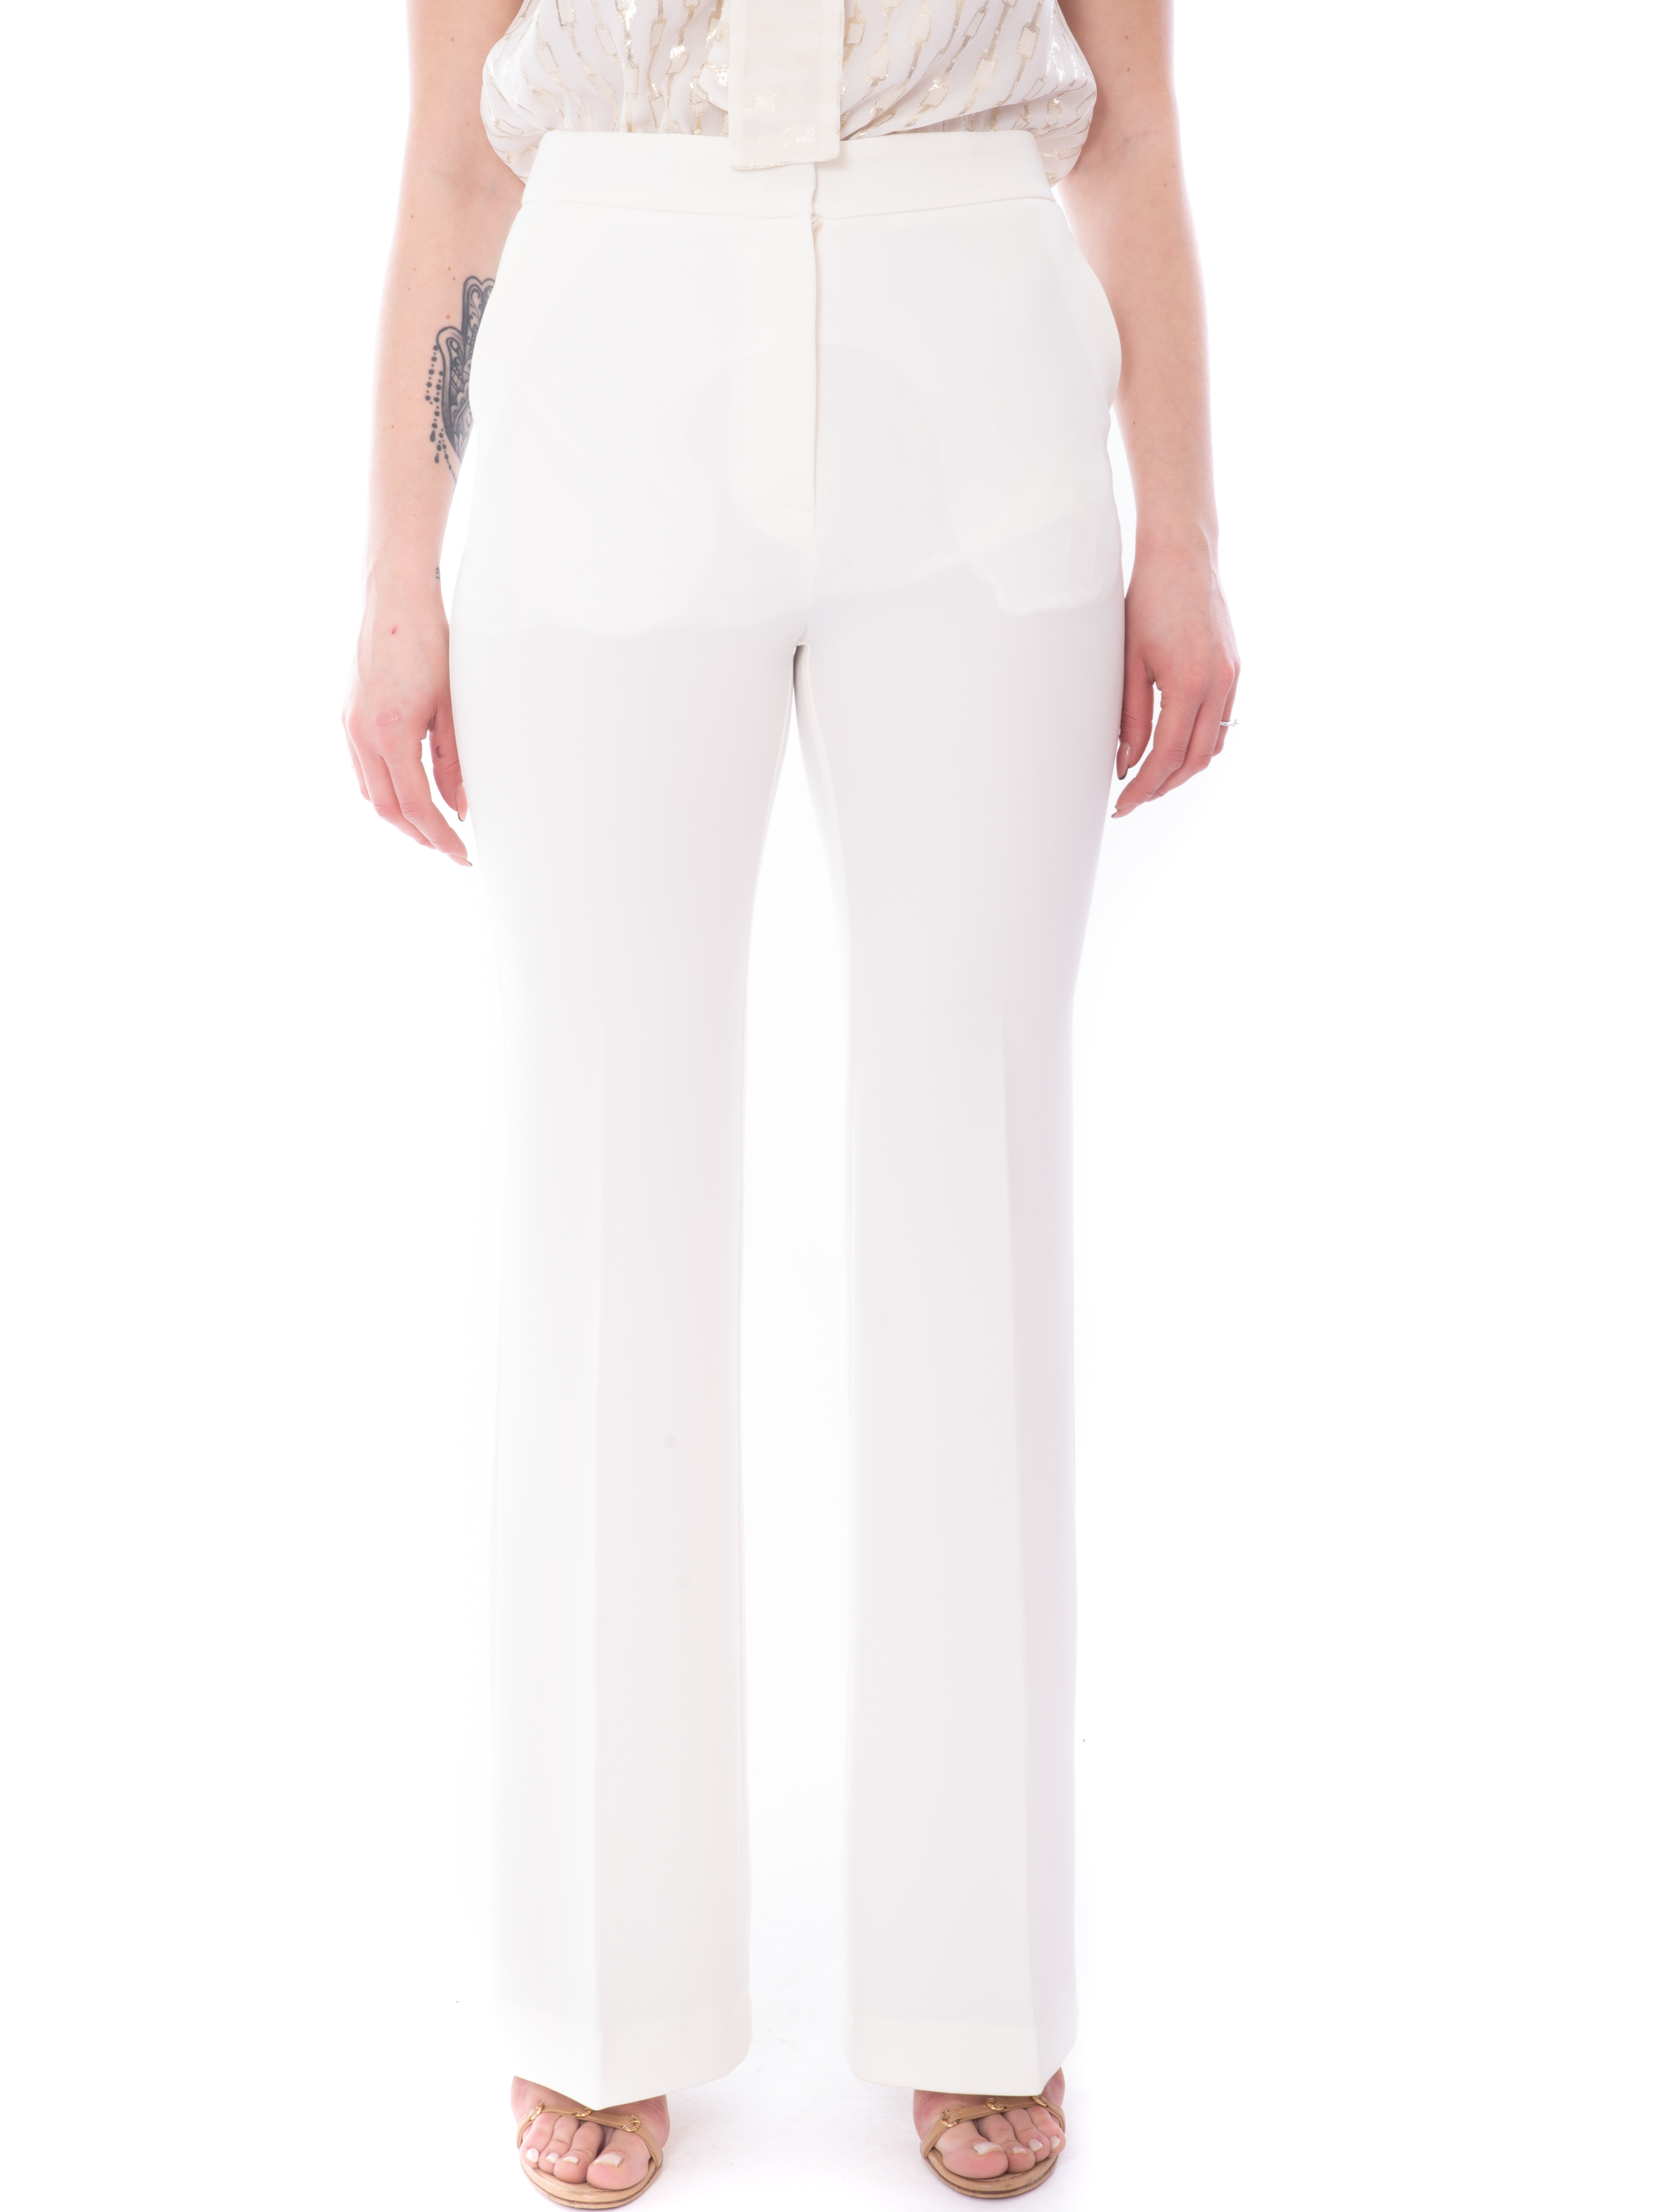 Pantalone SIMONA CORSELLINI